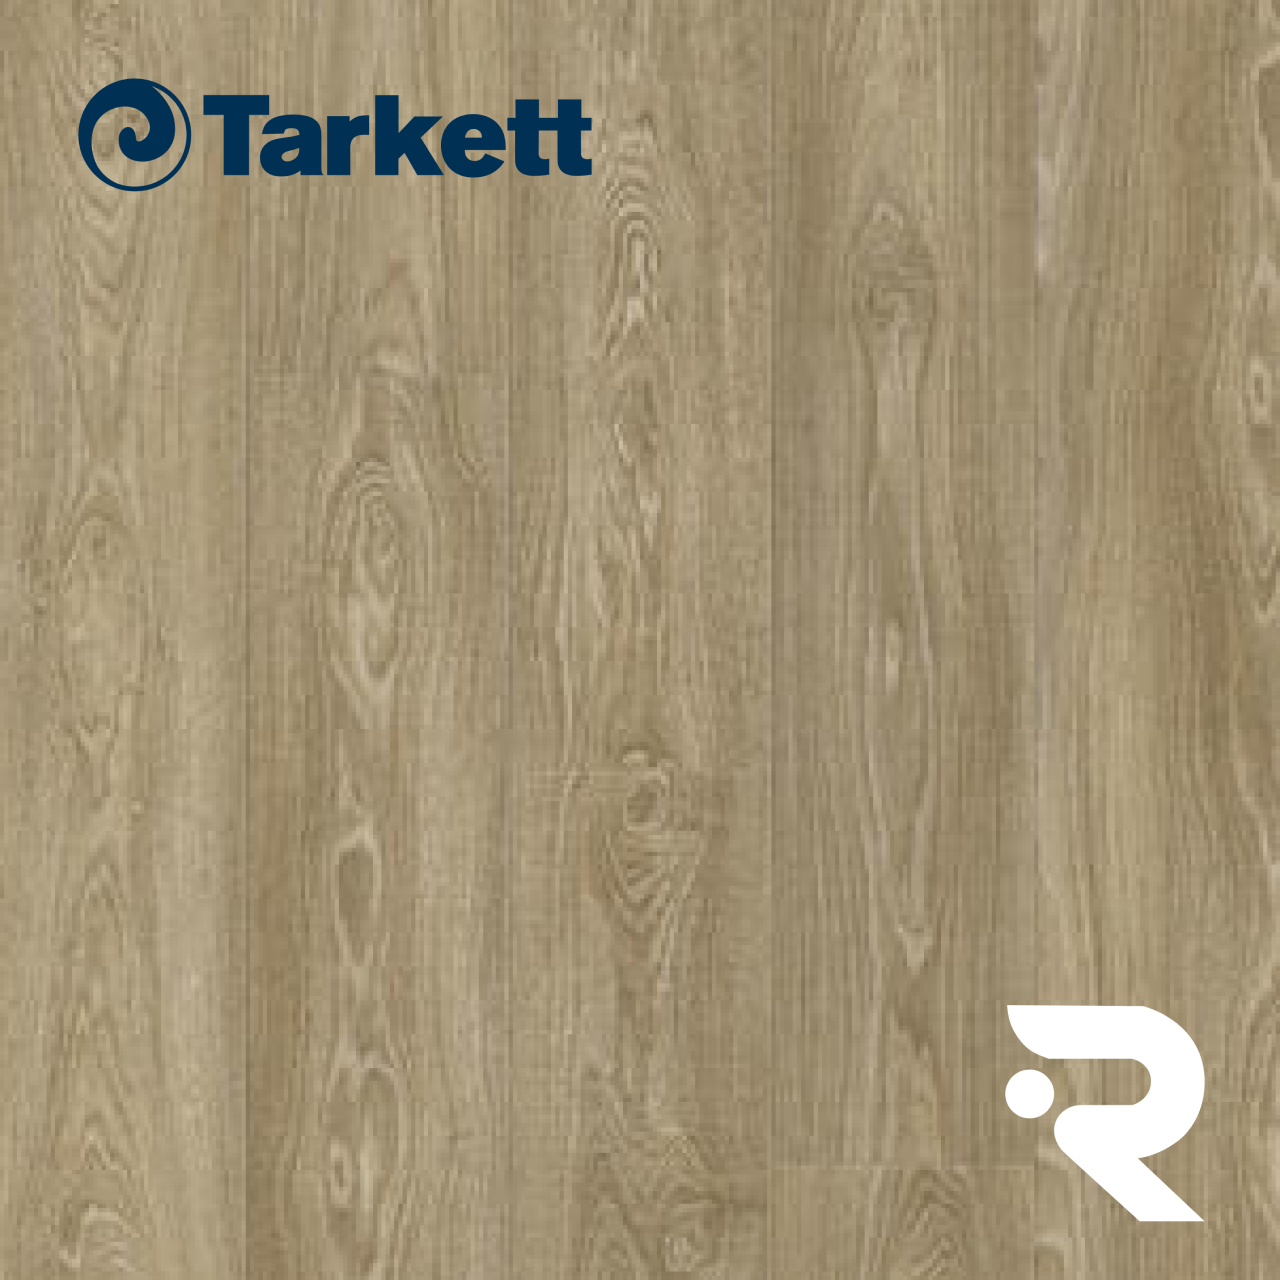 🌳 ПВХ плитка Tarkett | ModularT 7 - OAK STREET COLD BROWN | Art Vinyl | 1200 x 200 мм